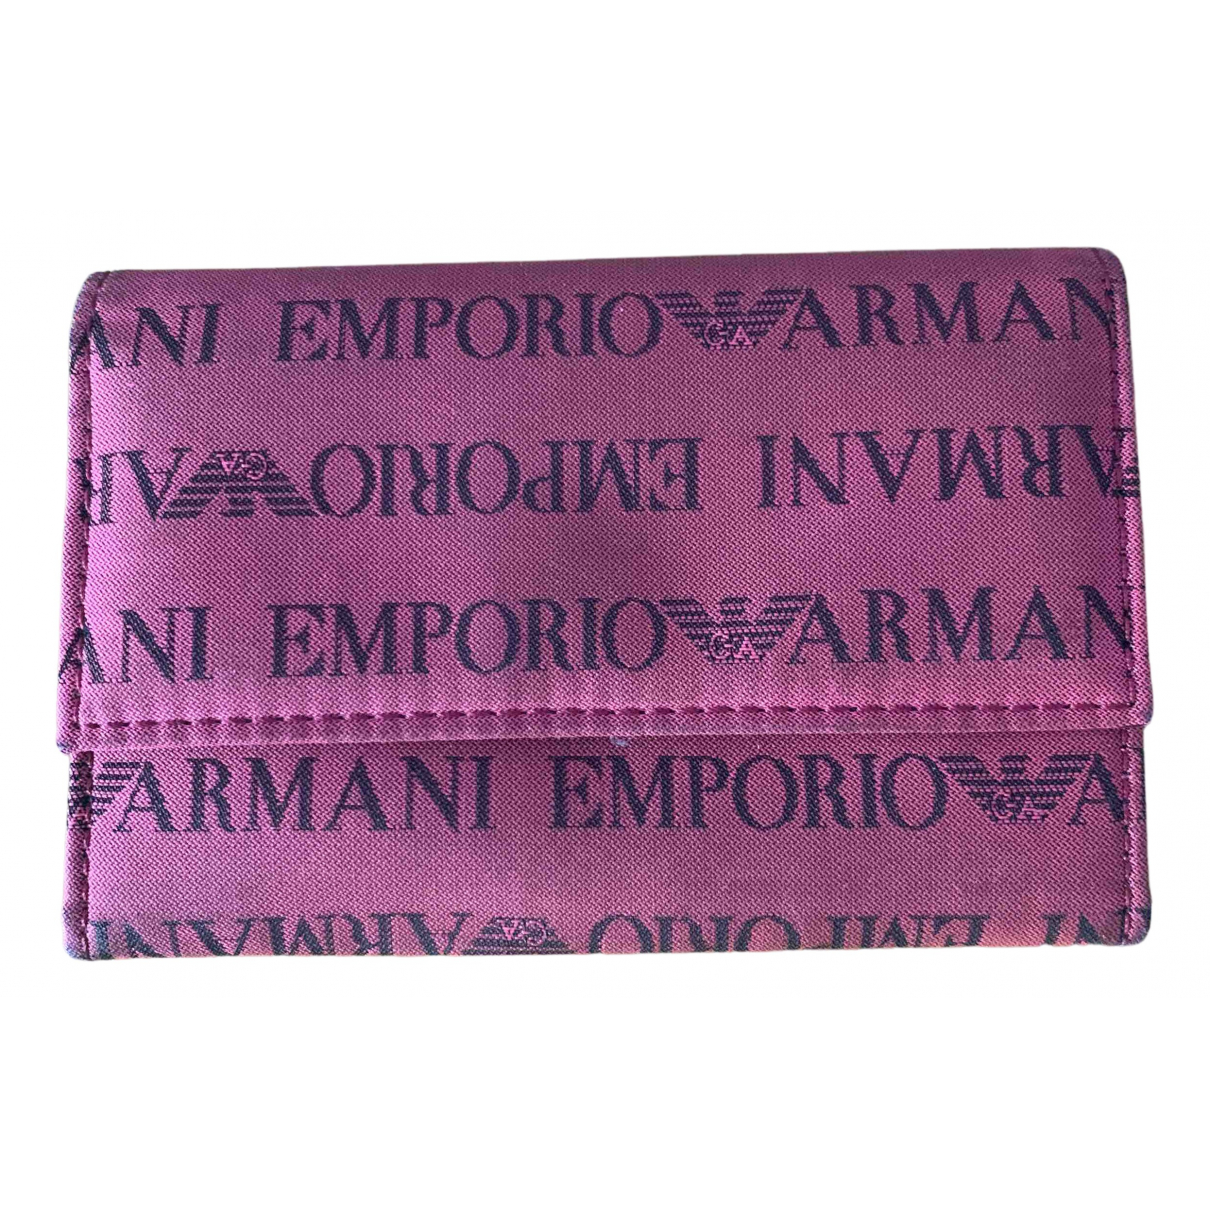 Emporio Armani - Portefeuille   pour femme en toile